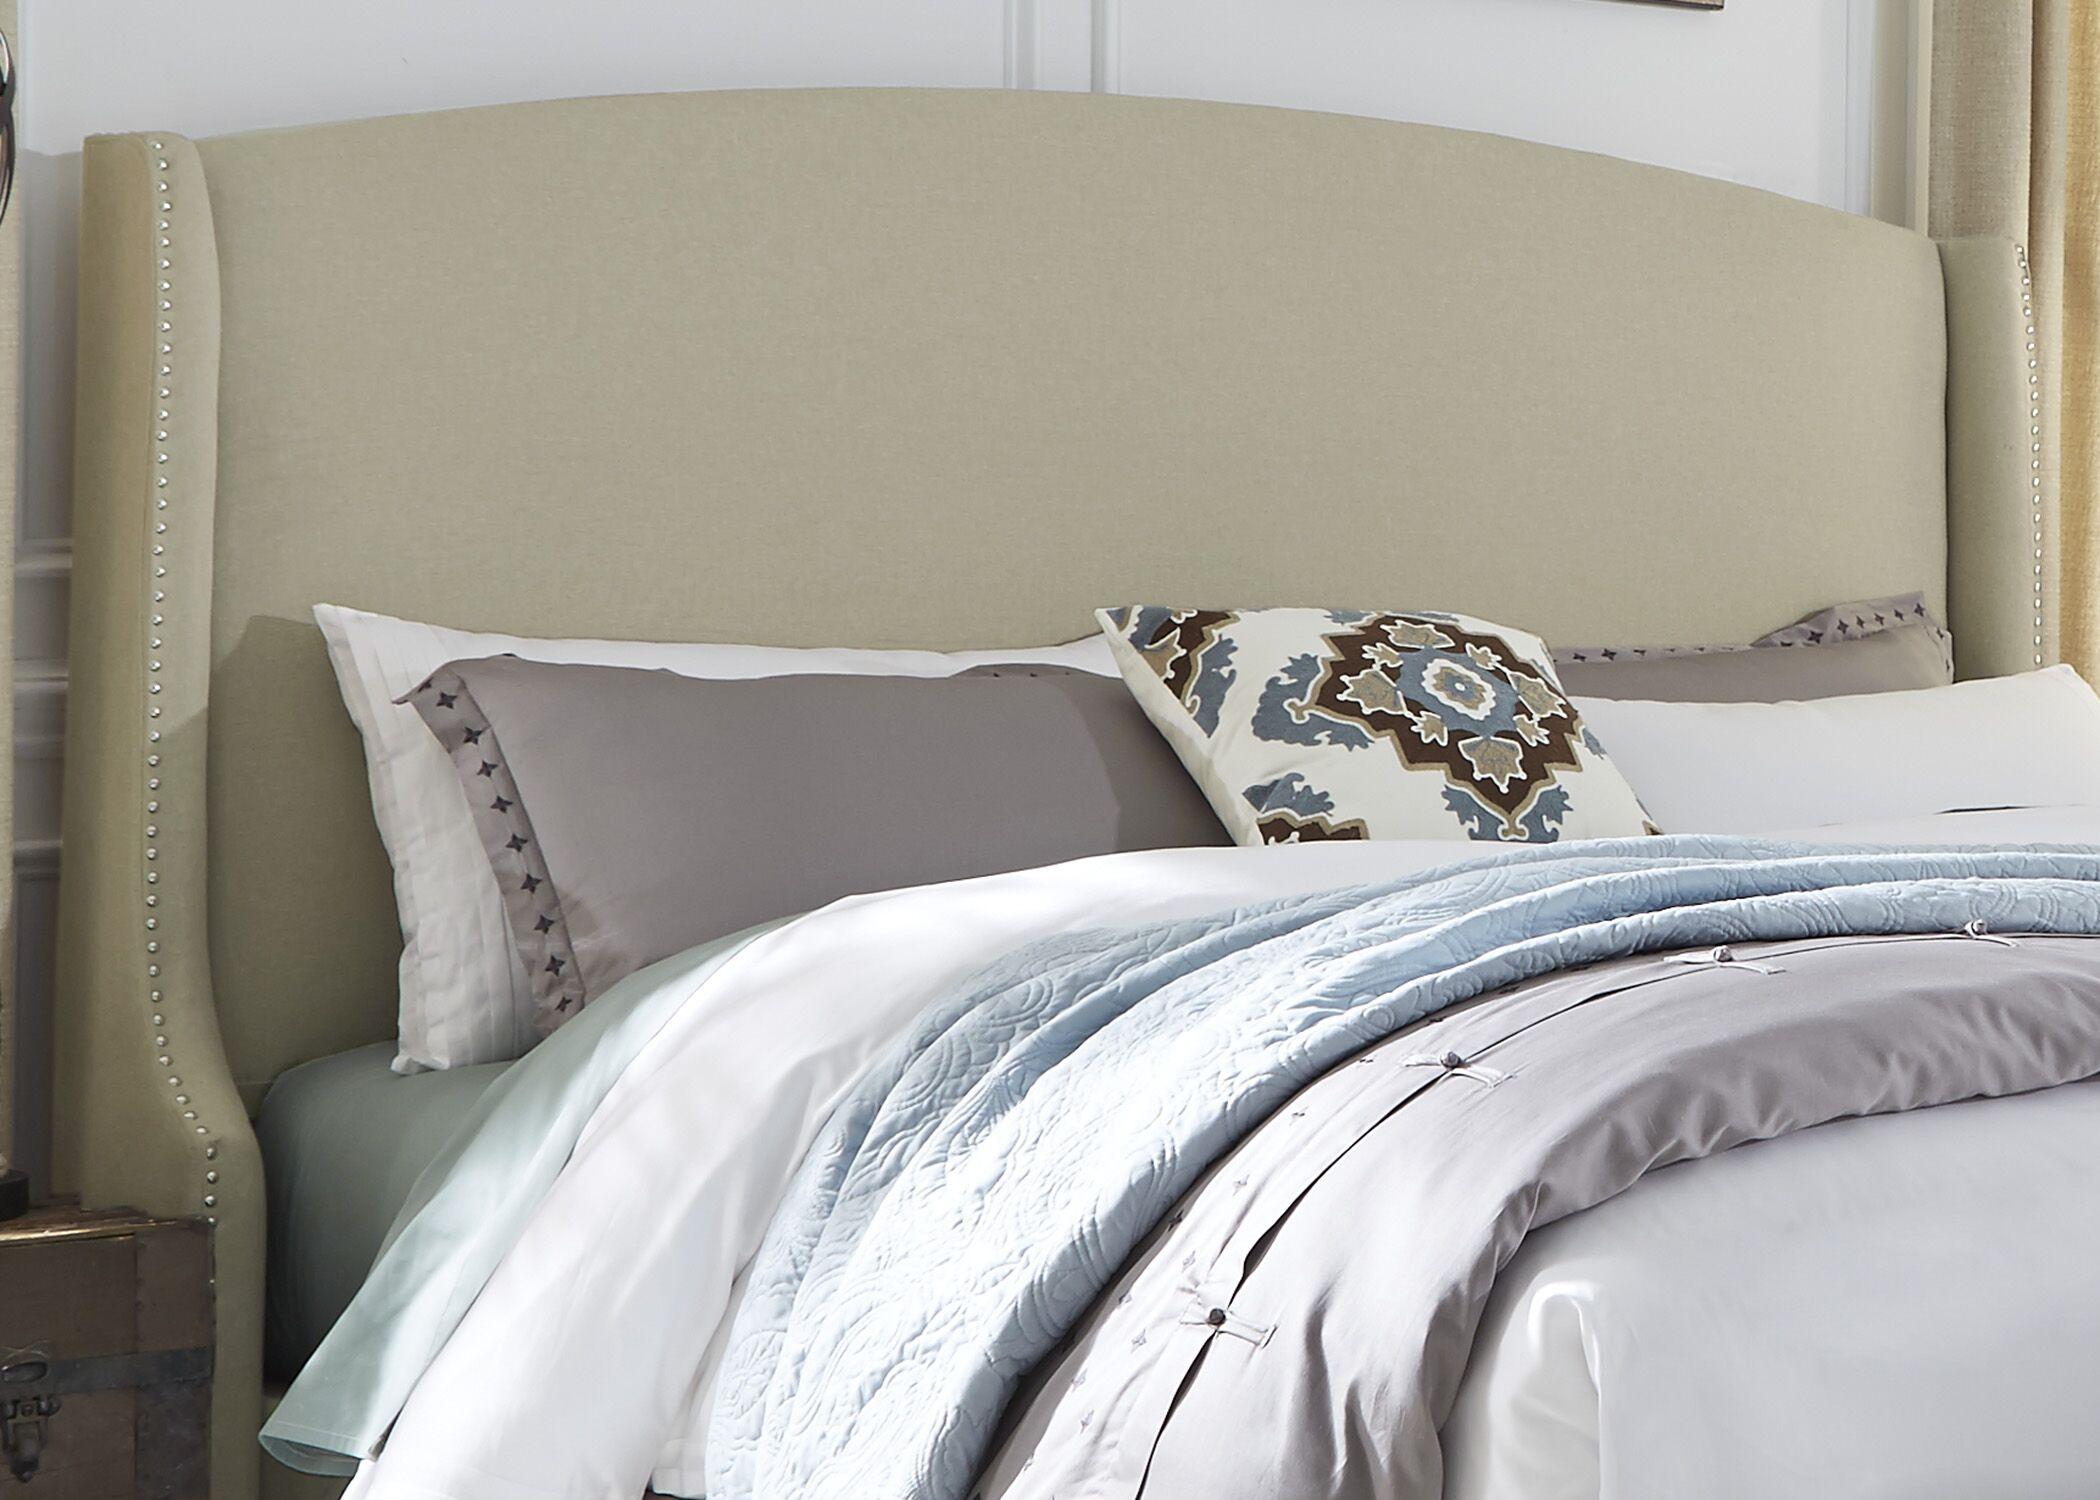 Dellinger Wing Shelter Upholstered Wingback Headboard Upholstery: Beige, Size: King